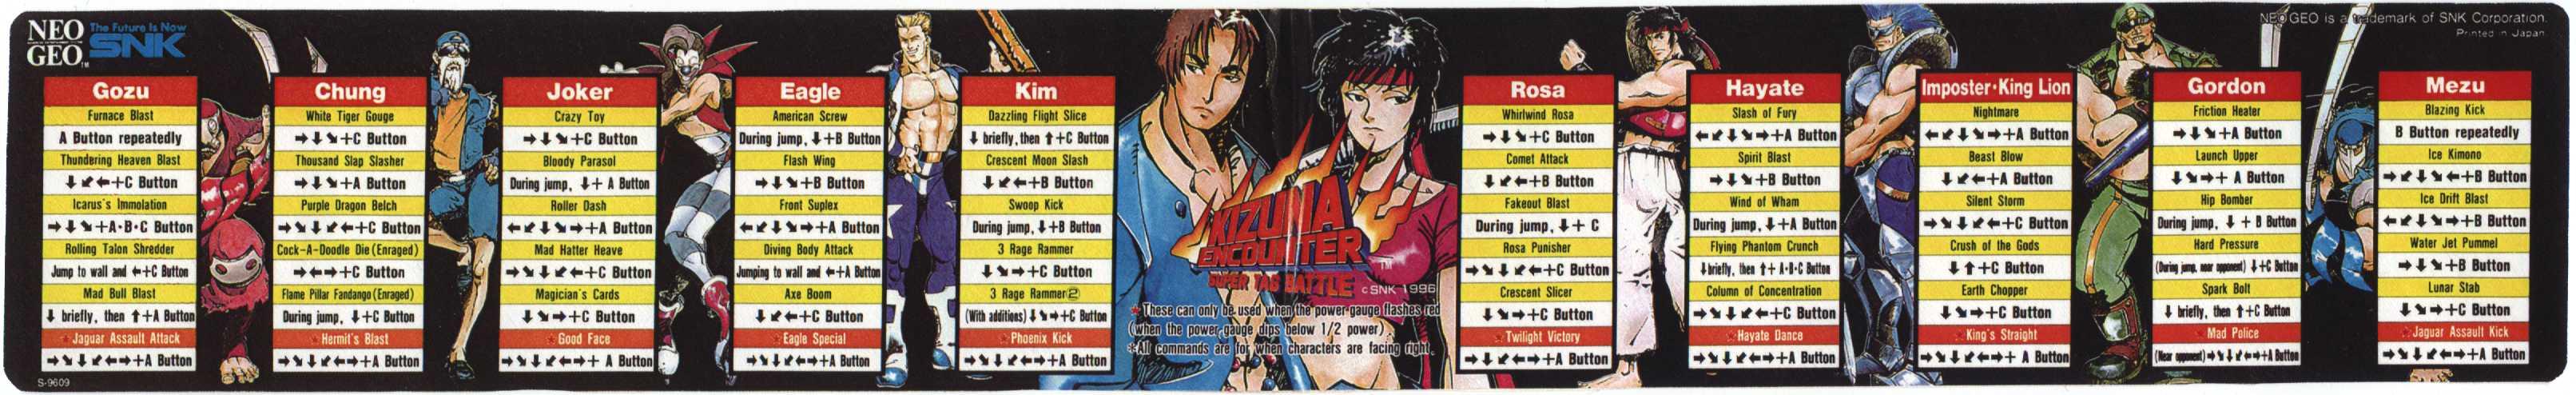 Kizuna Encounter Super Tag Battle Tfg Review